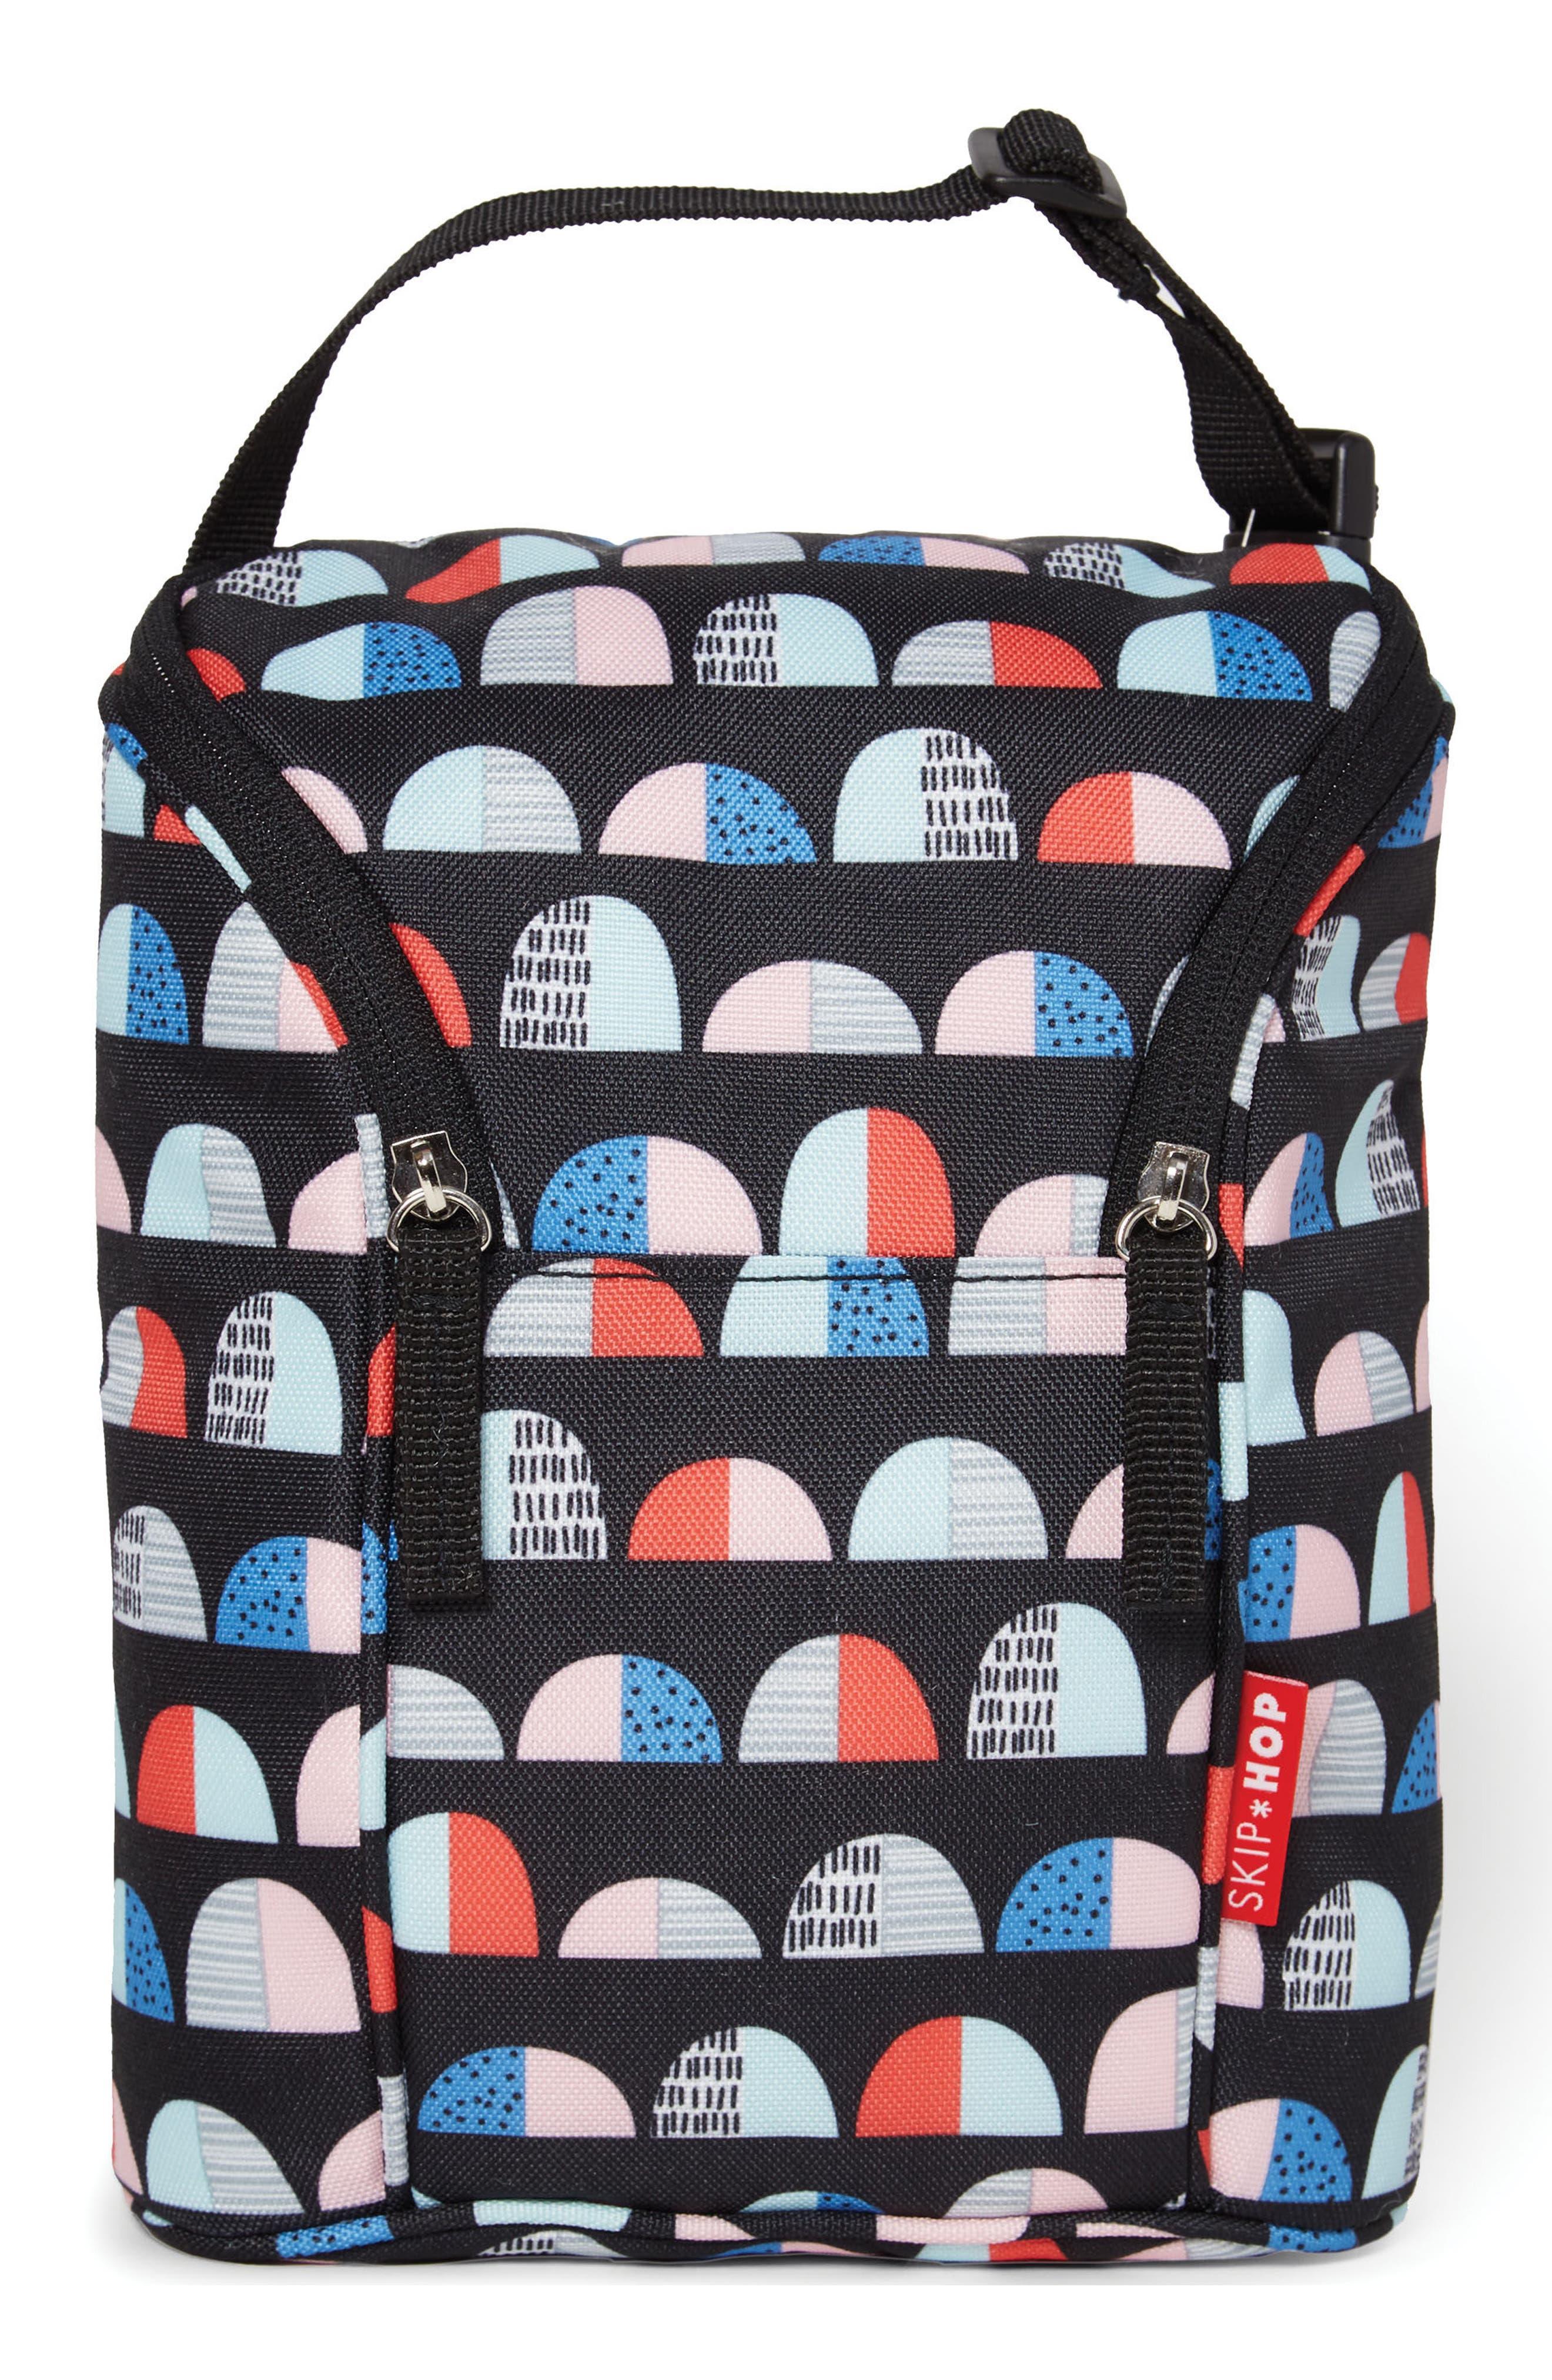 SKIP HOP 'Grab & Go' Double Bottle Bag